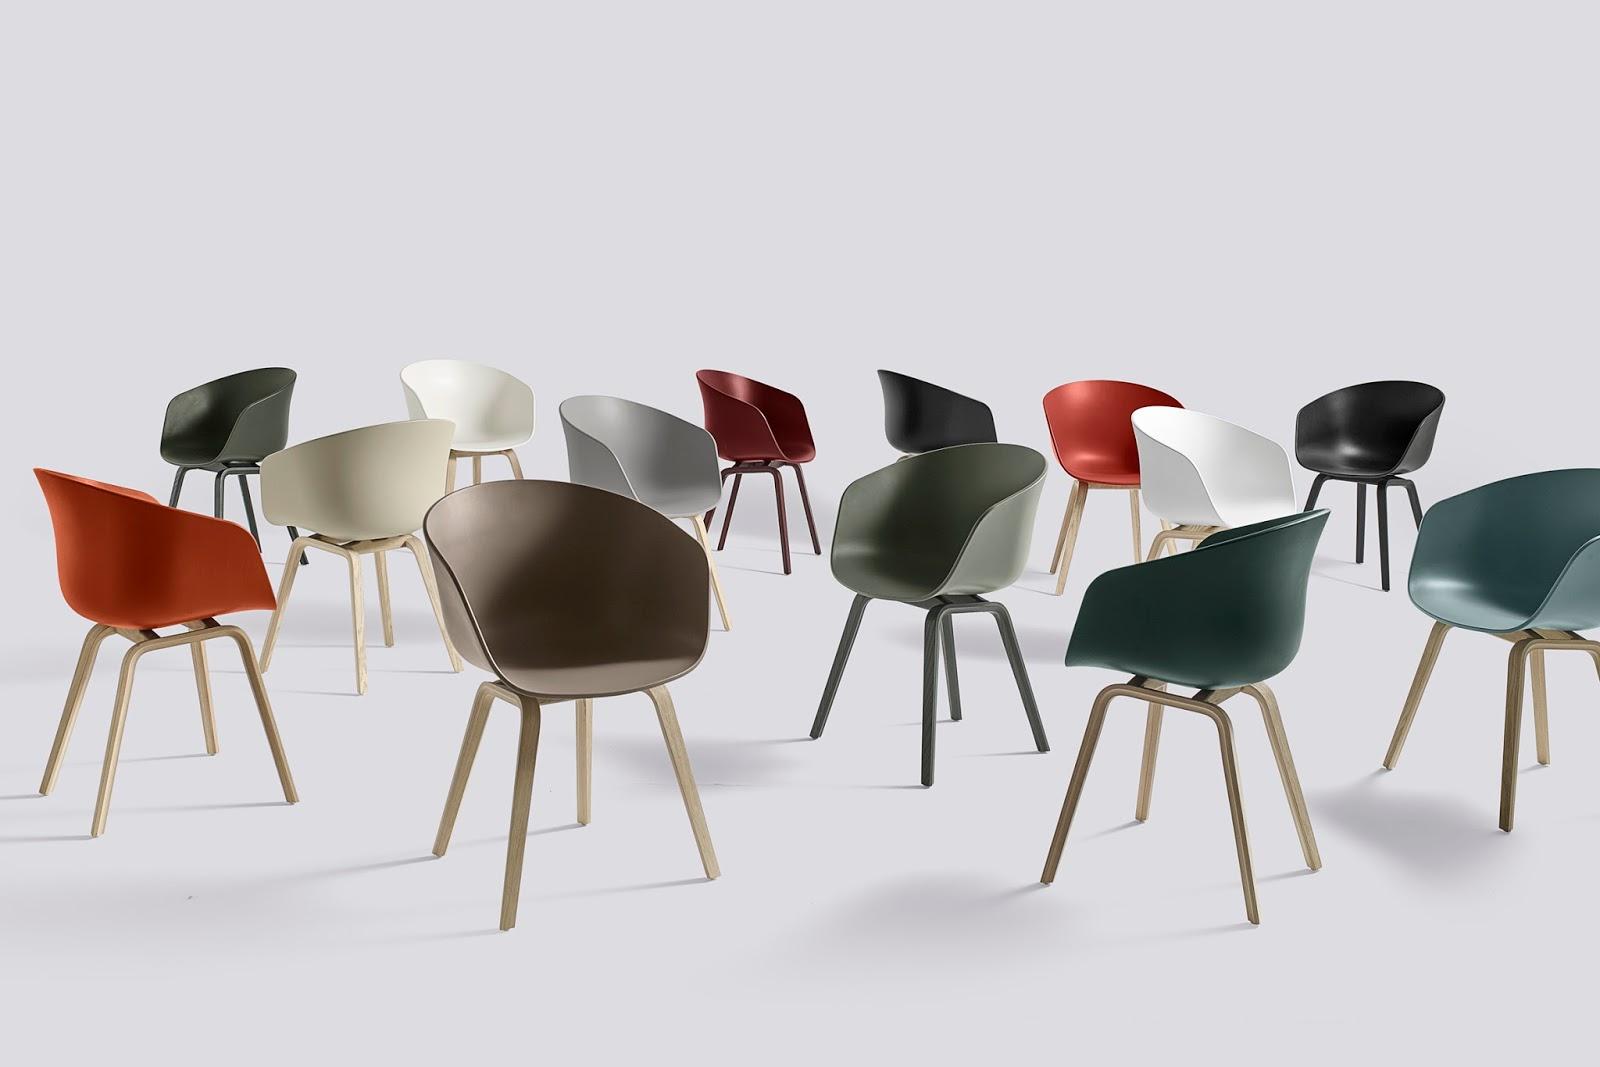 Modern minimalistisch interieur met stoelen koffietafel vloerlamp